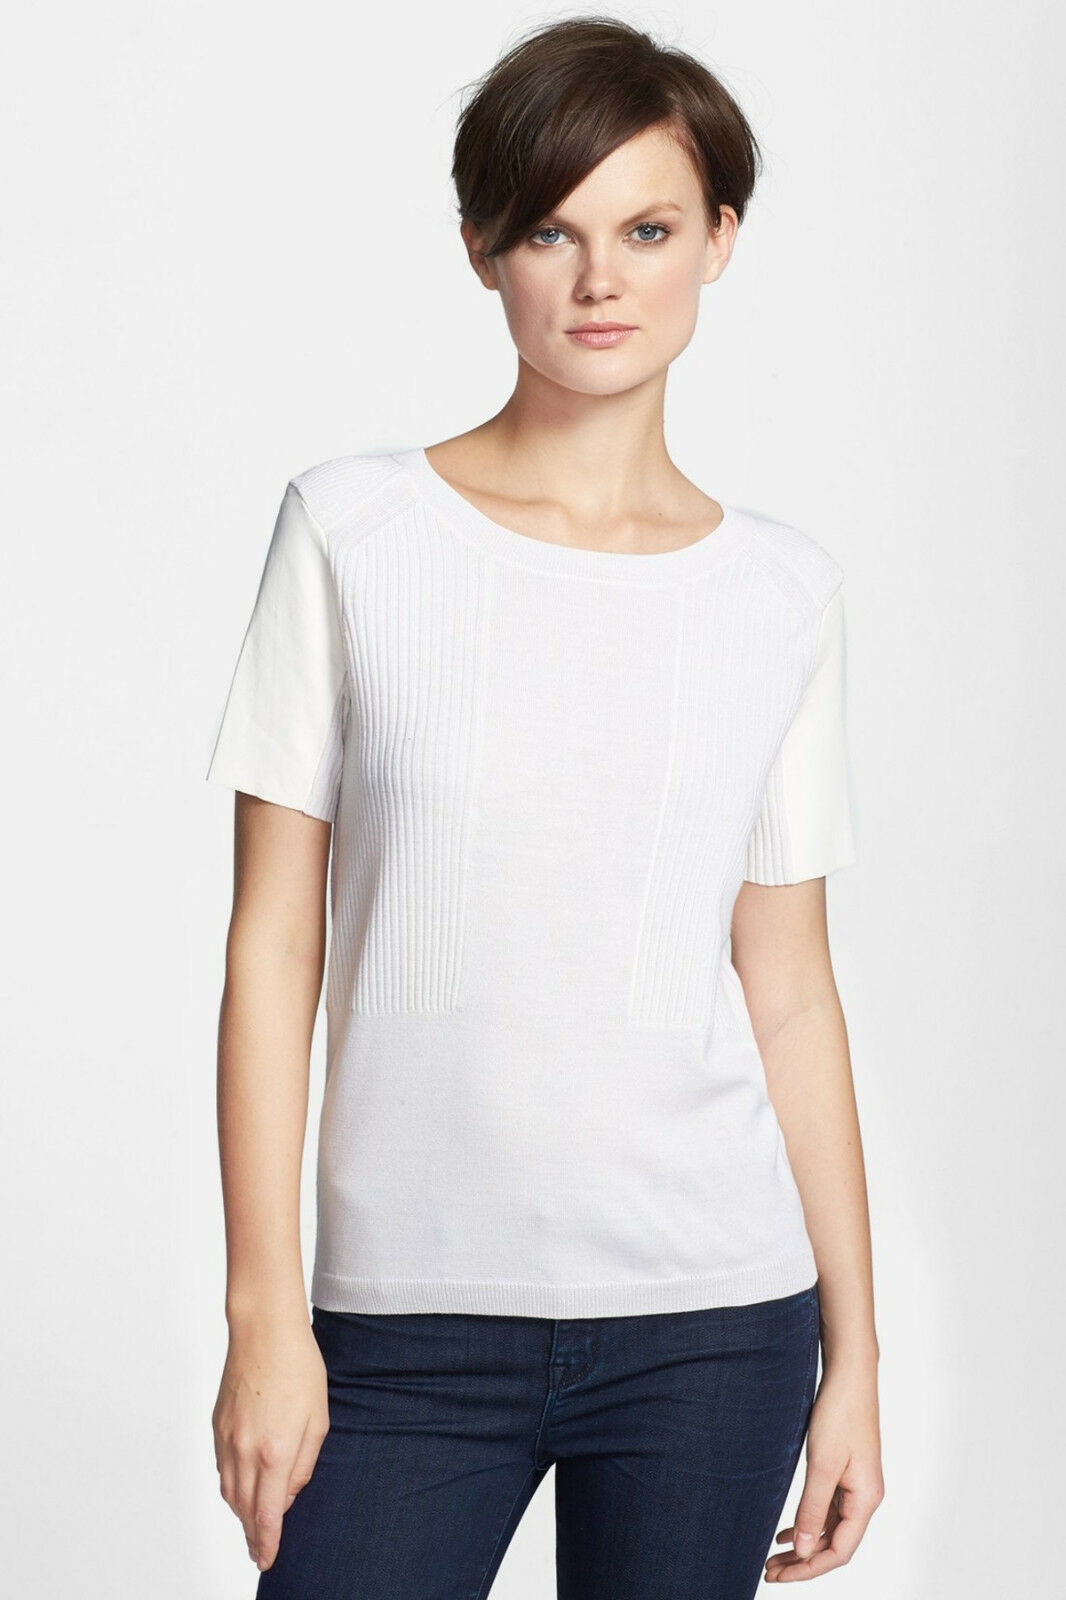 NWT S M 2 4 6 VINCE Leather Sleeve Sweater Tee shirt WOOL LAMB SKIN silk